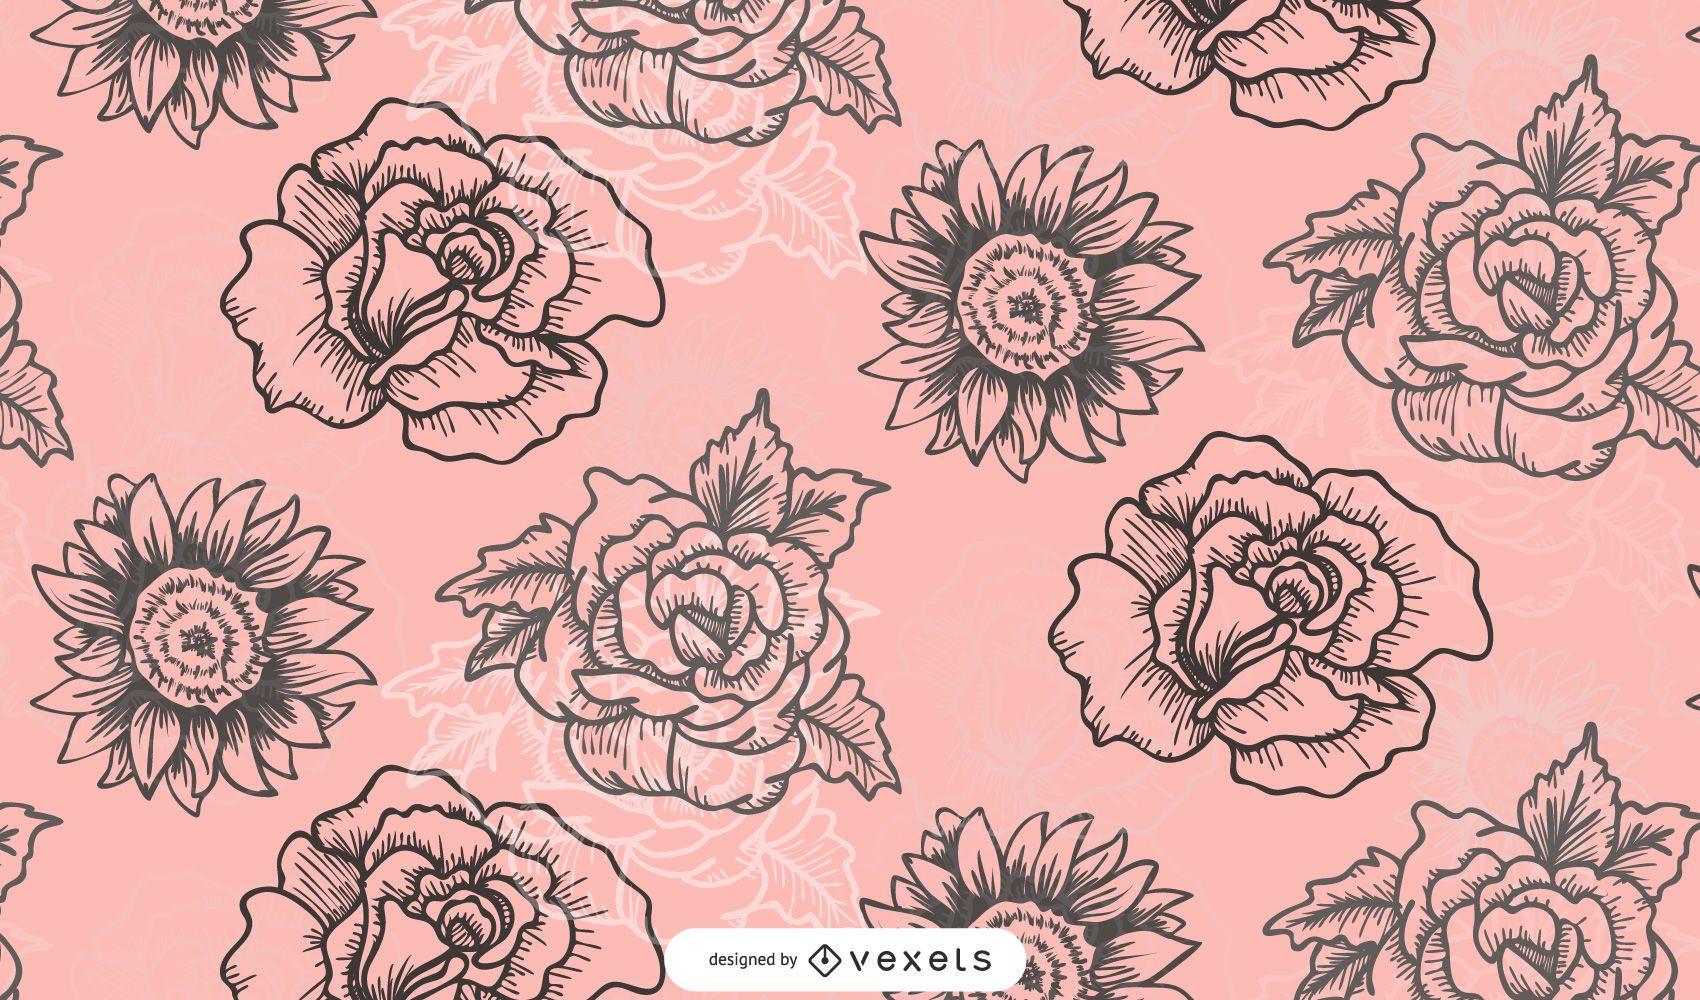 Patrón de flor de diseño de moda